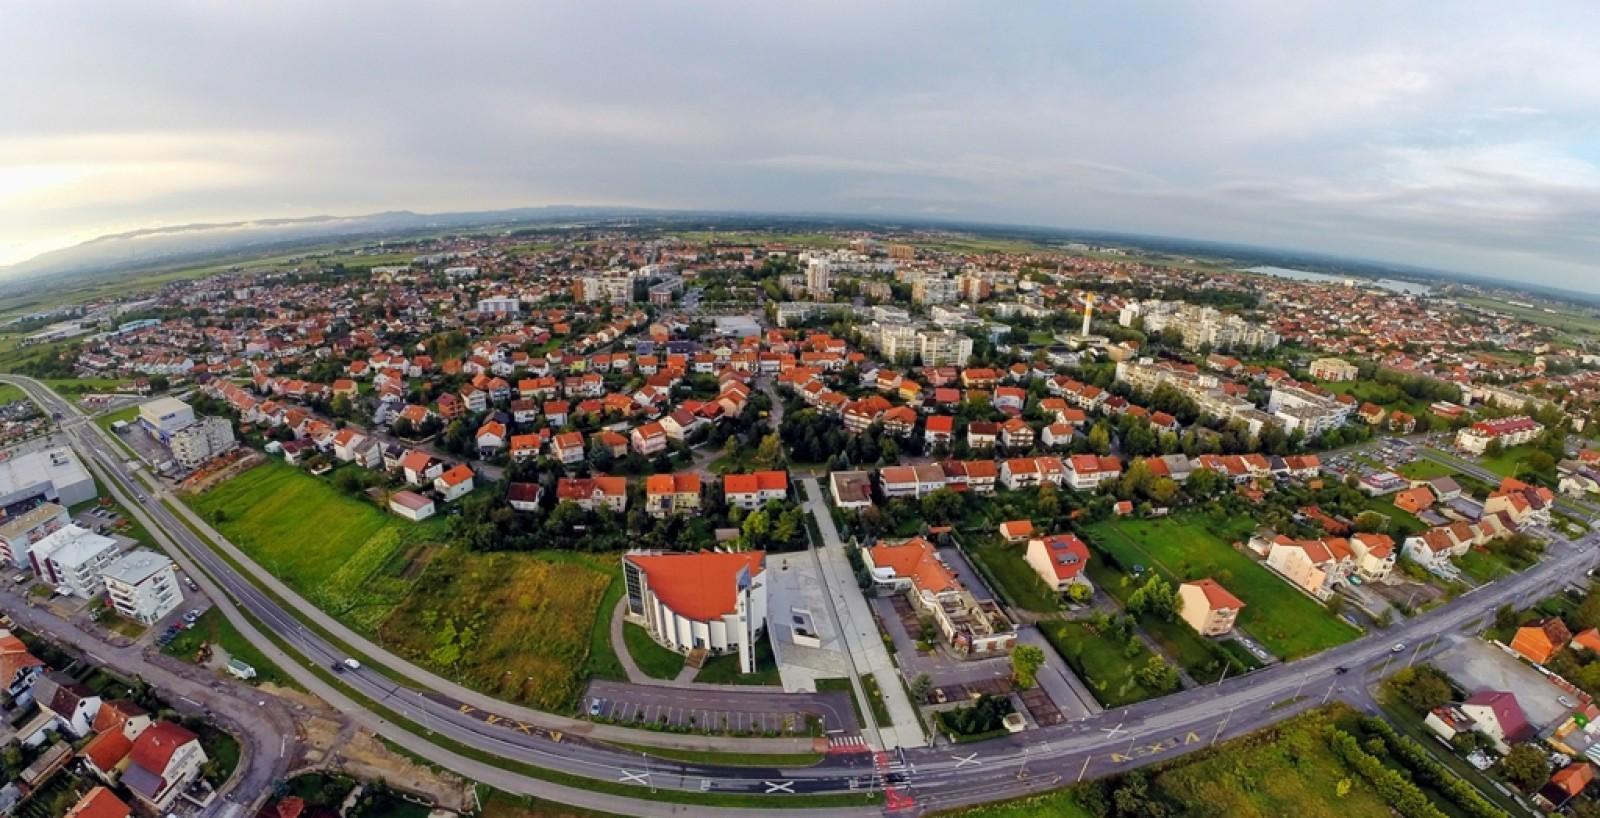 About Velika Gorica